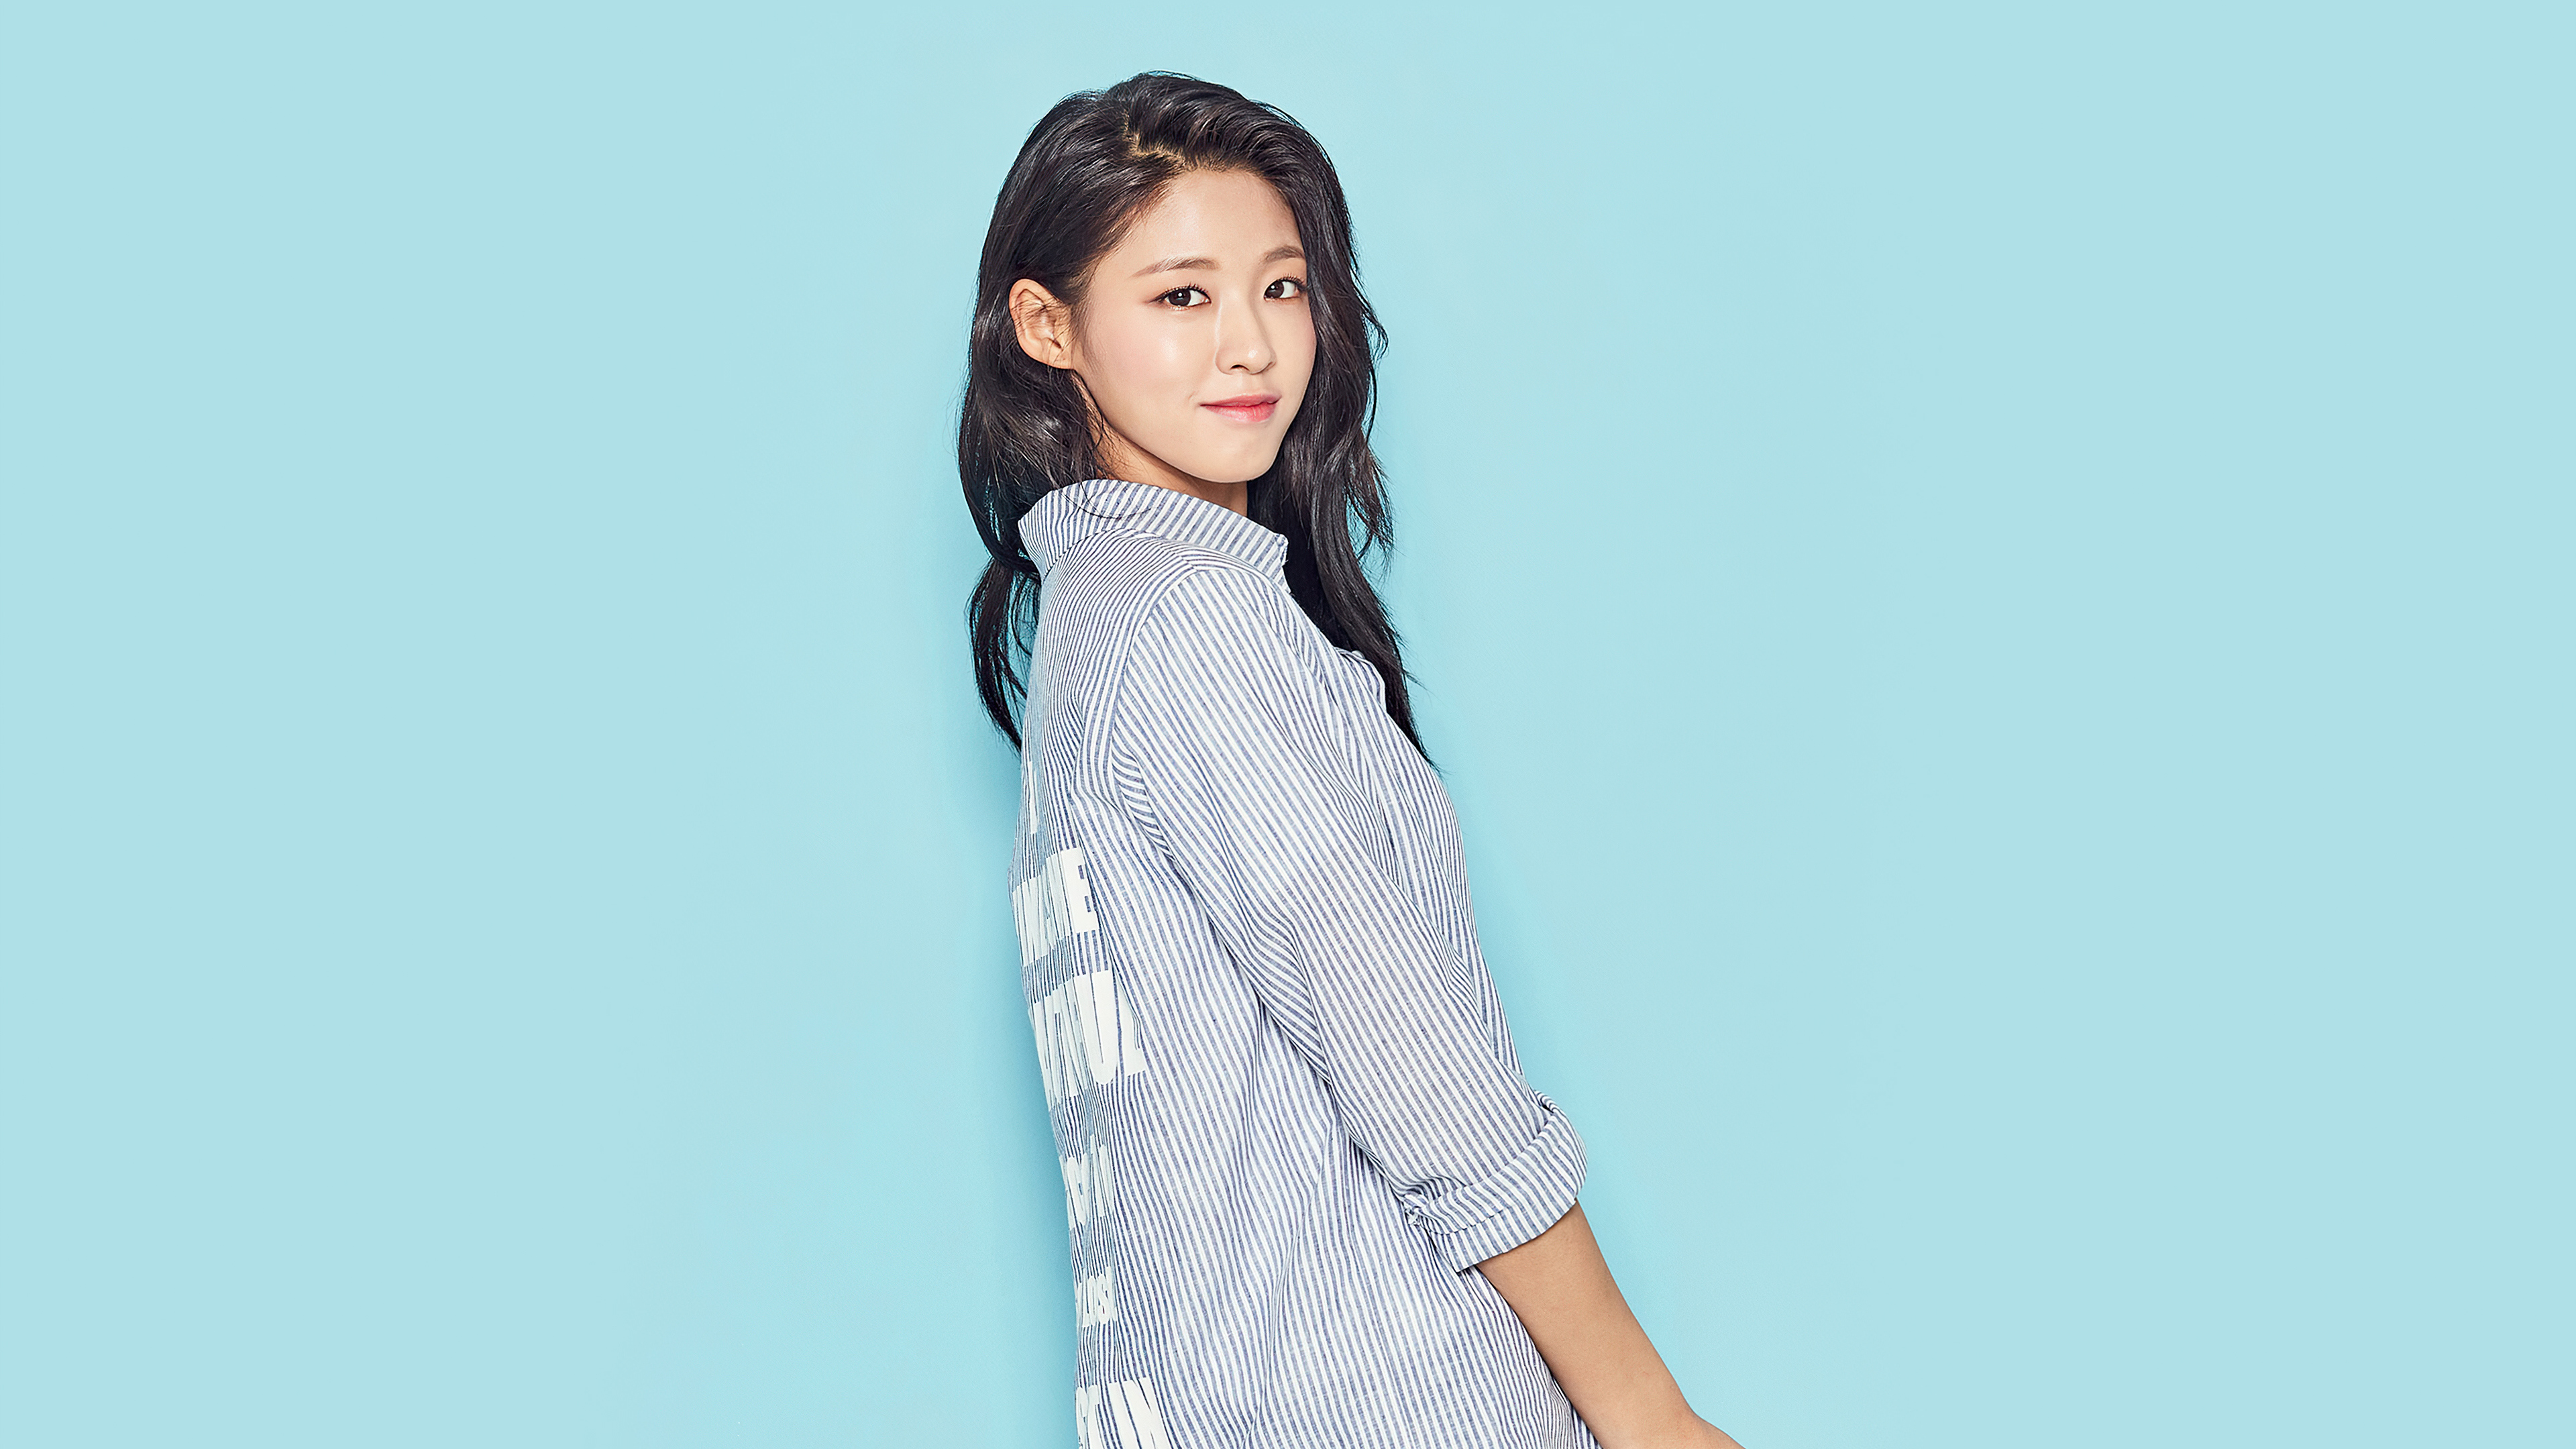 Fondos de pantalla Kim Seolhyun